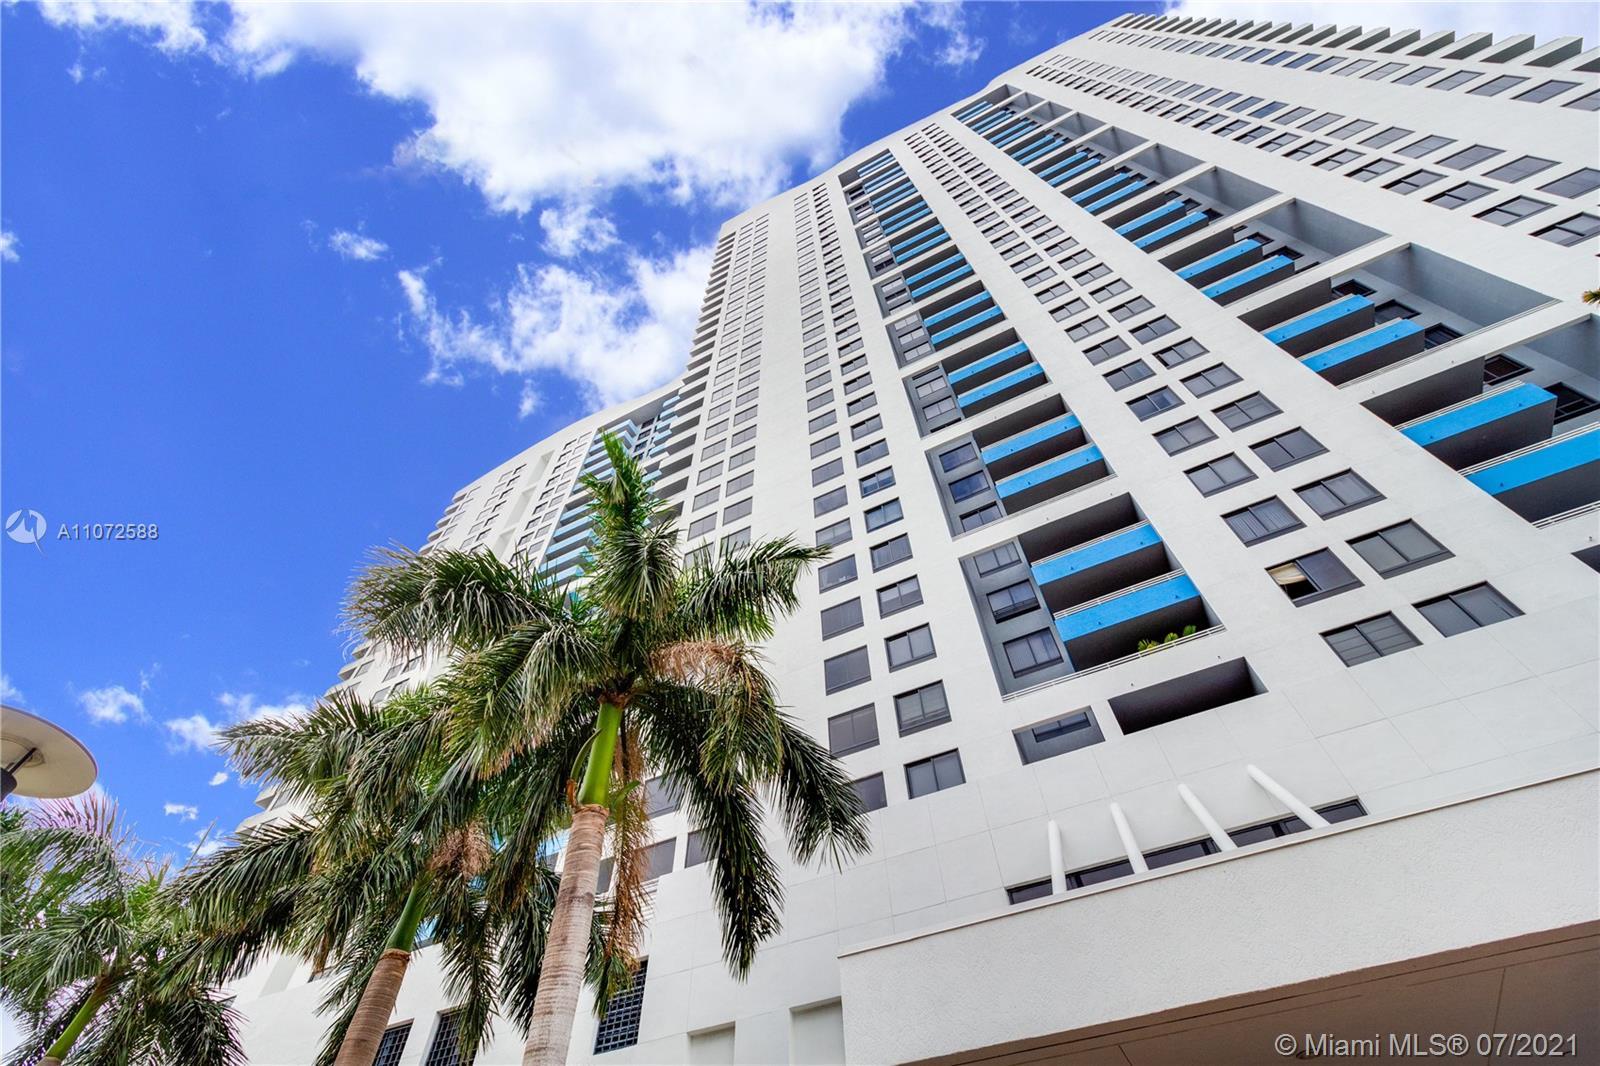 Waverly South Beach #1408 - 1330 West Ave #1408, Miami Beach, FL 33139